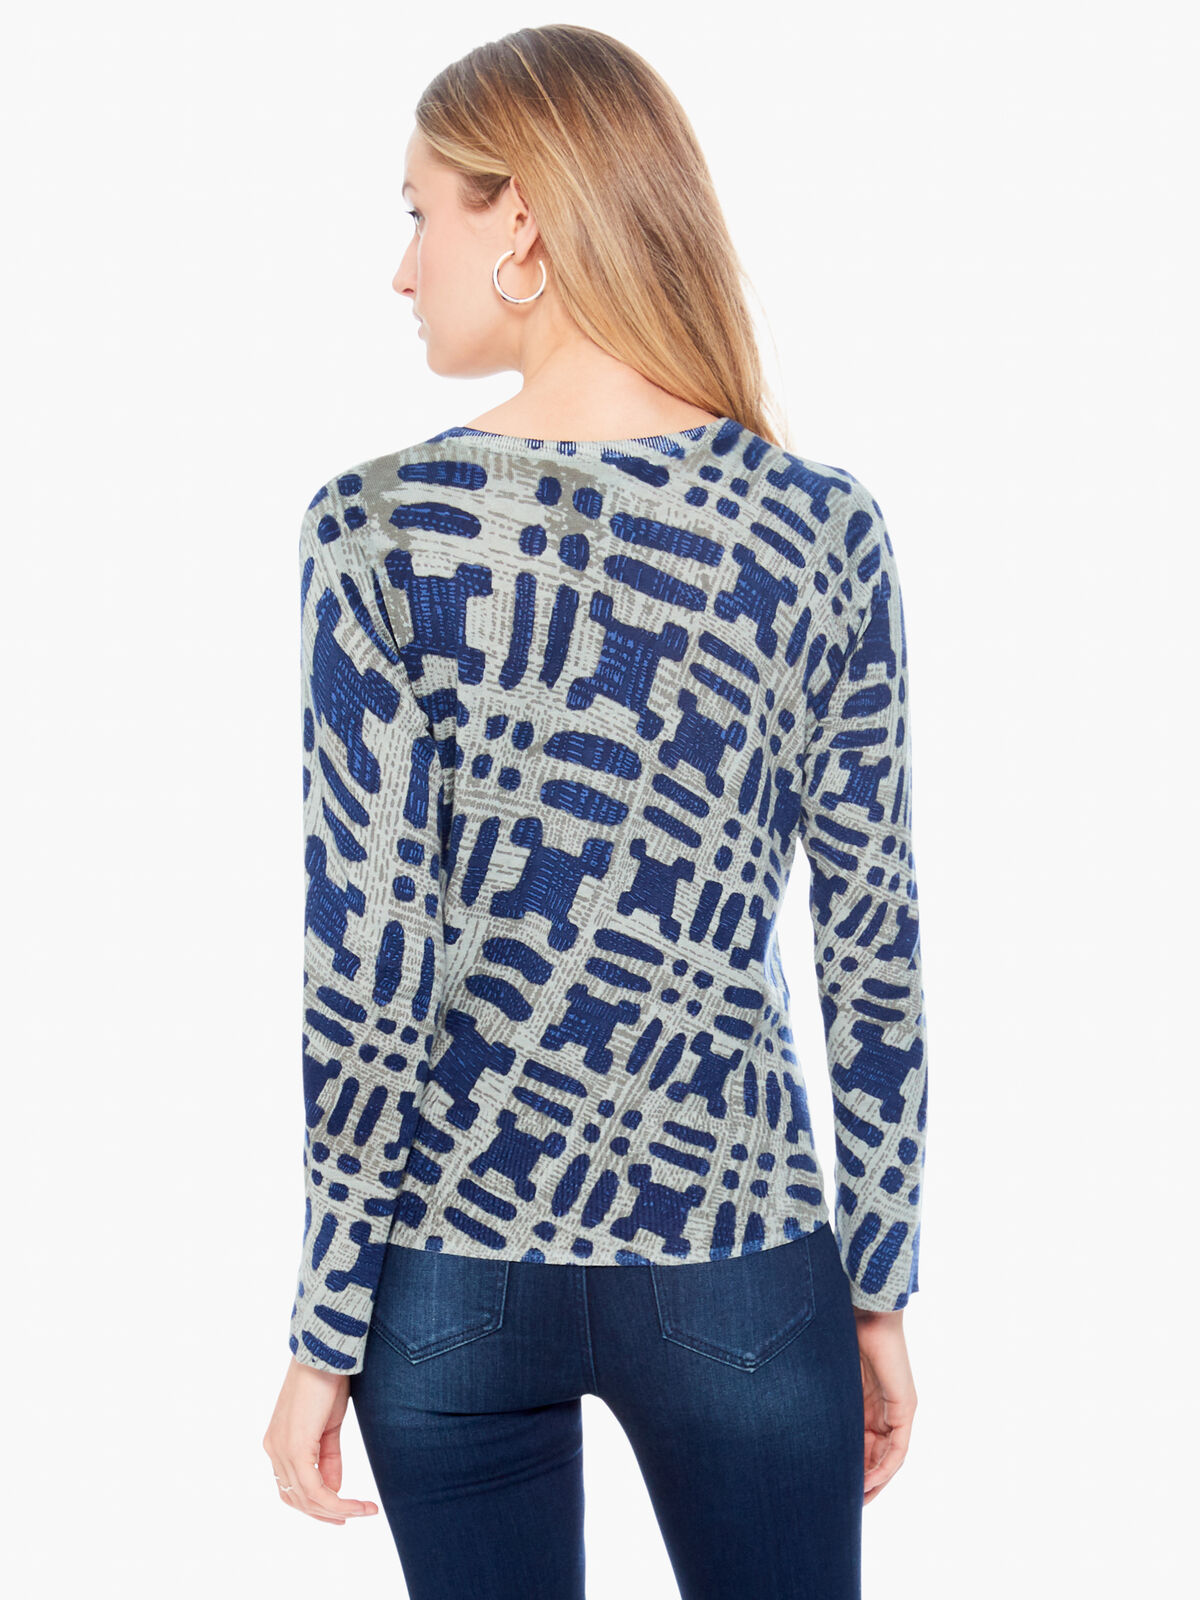 Ikat Camo Sweater